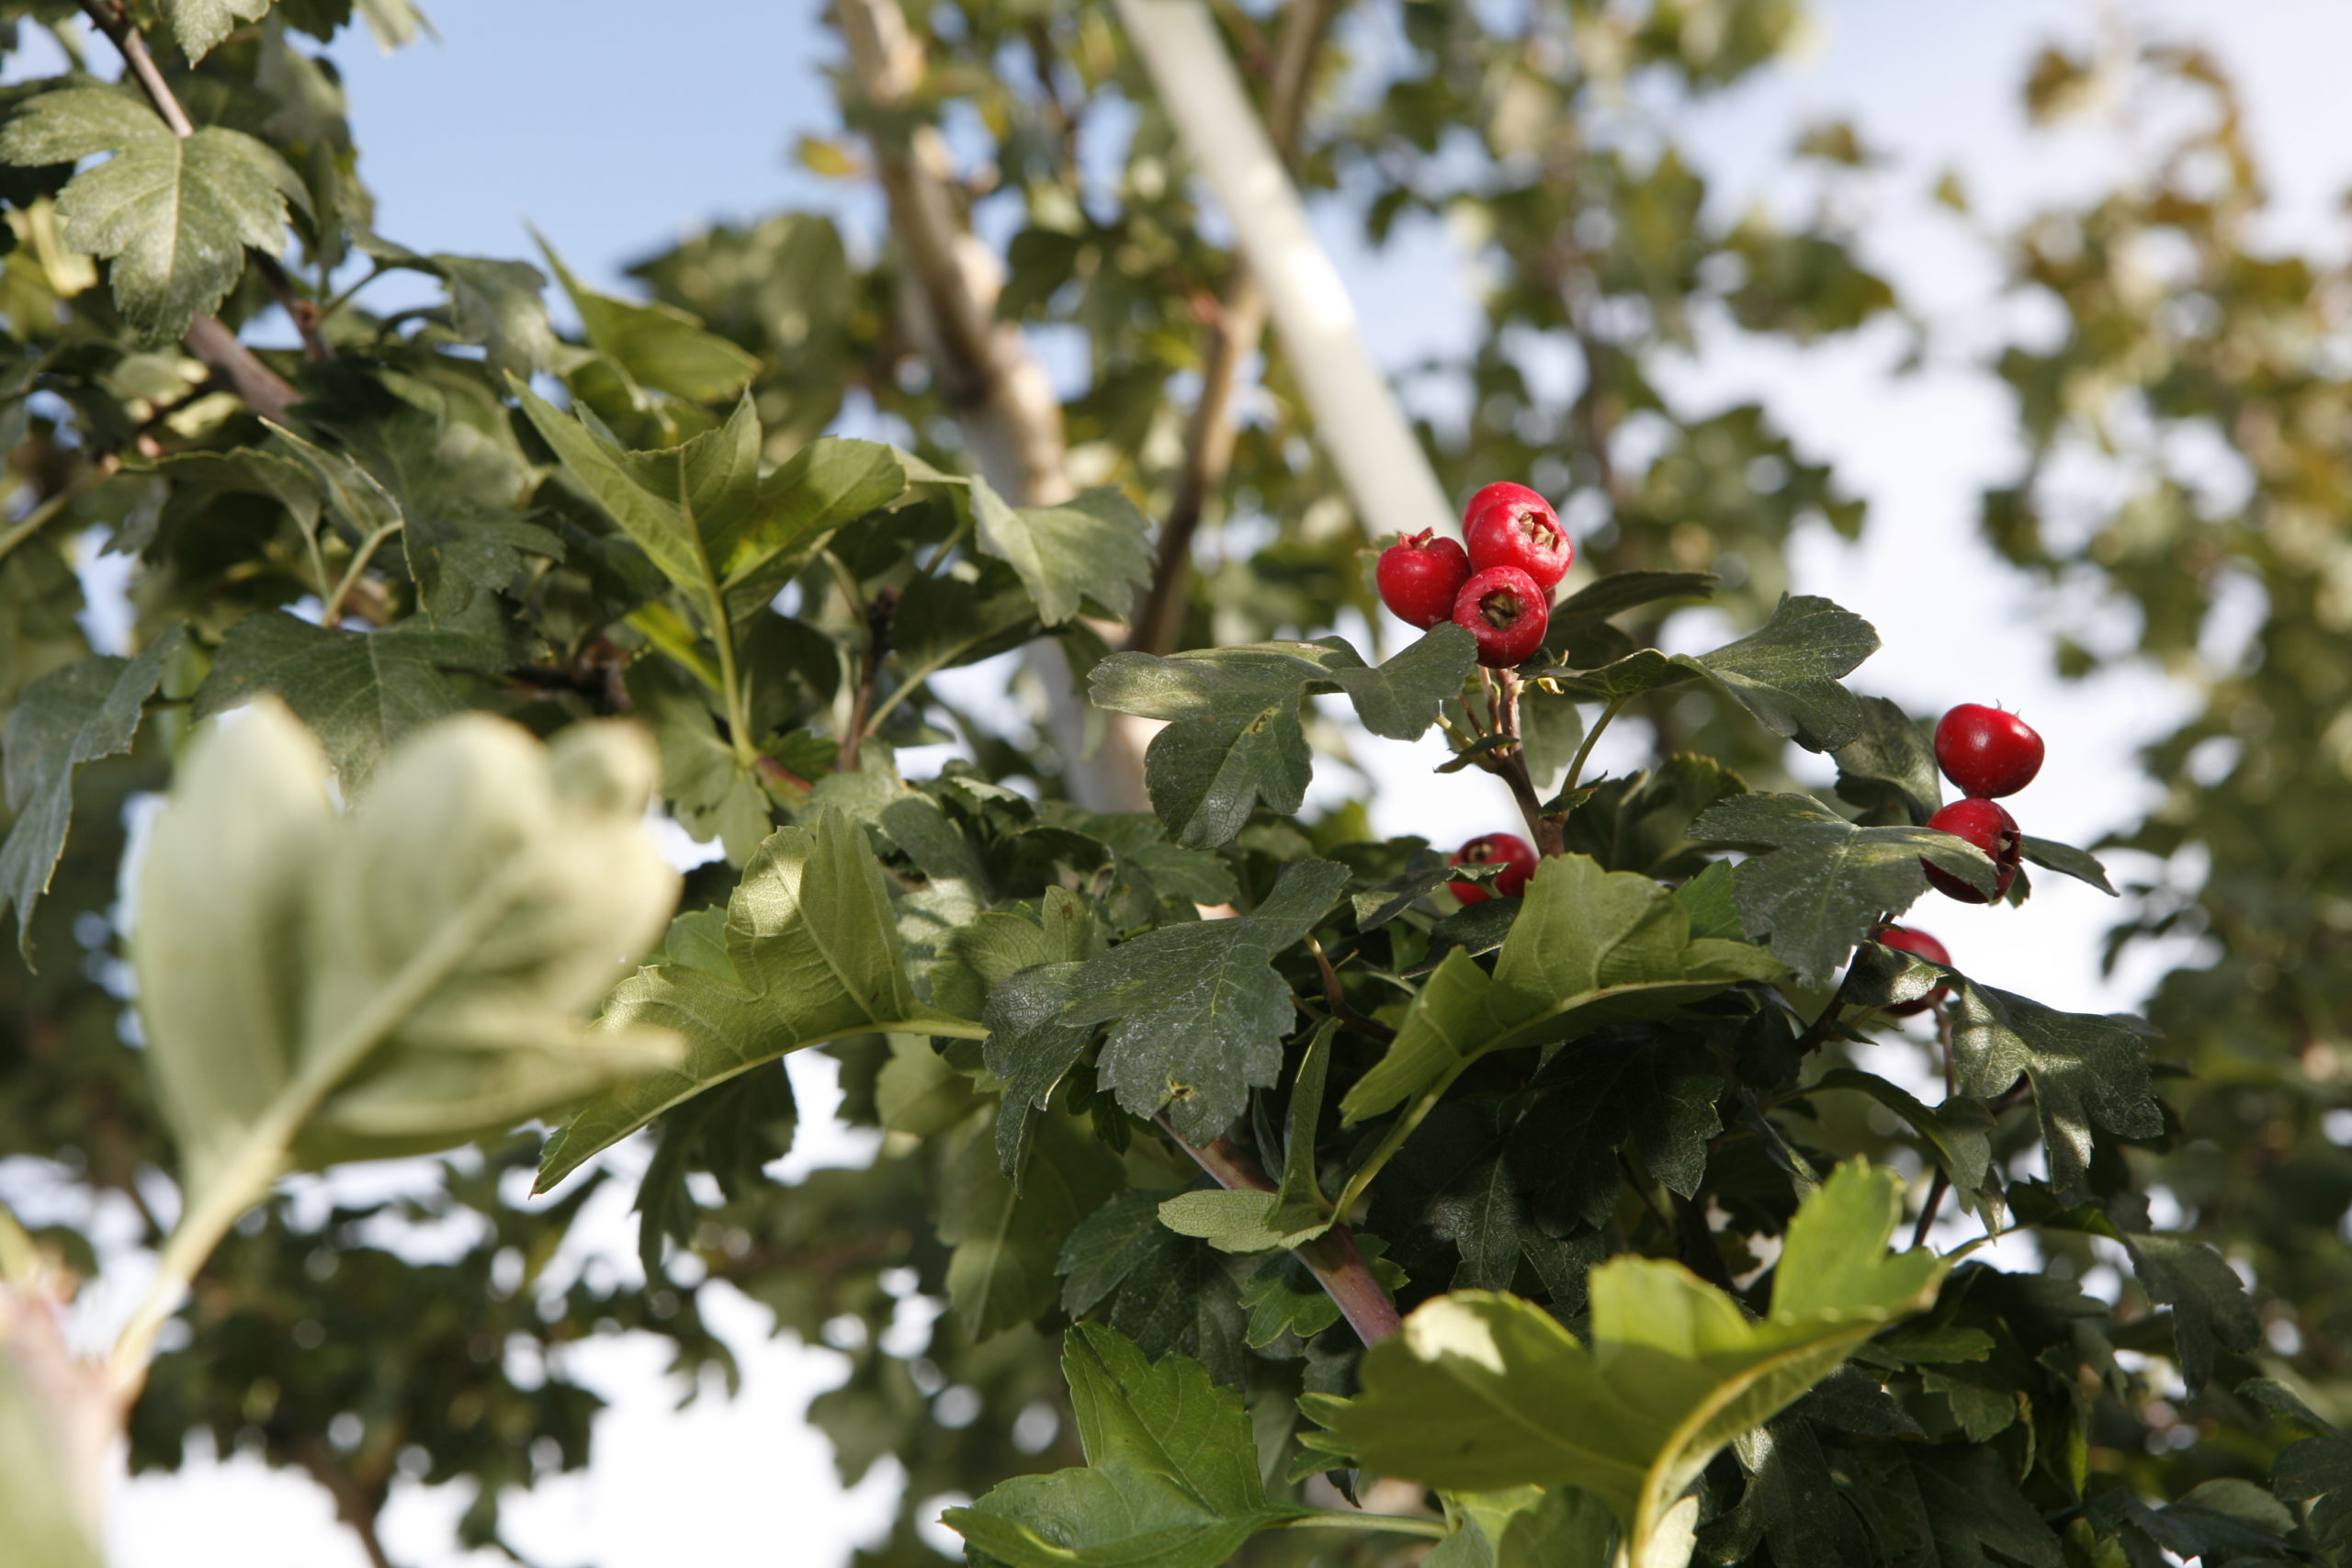 toba hawthorn berries amidst green leaves